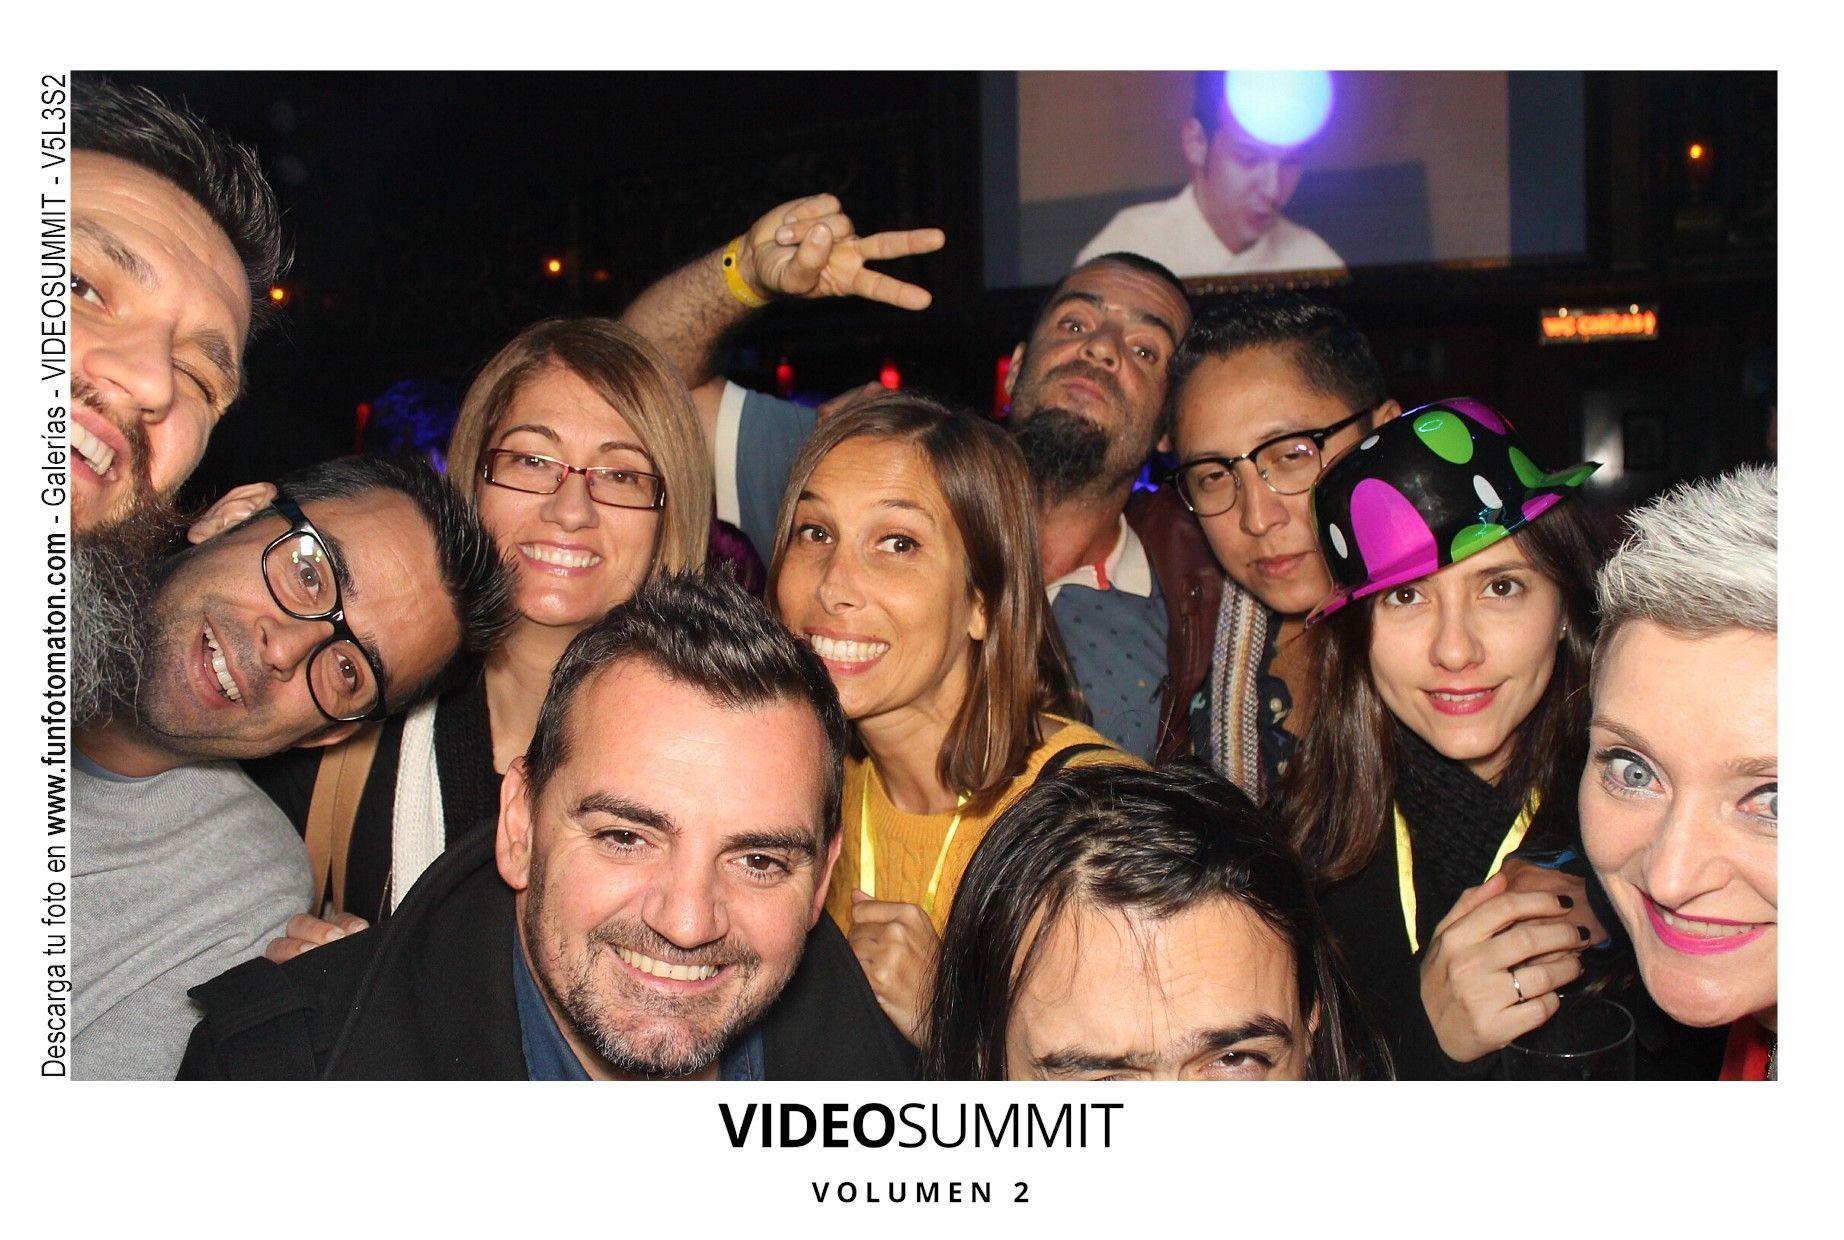 videosummit-vol2-club-party-020